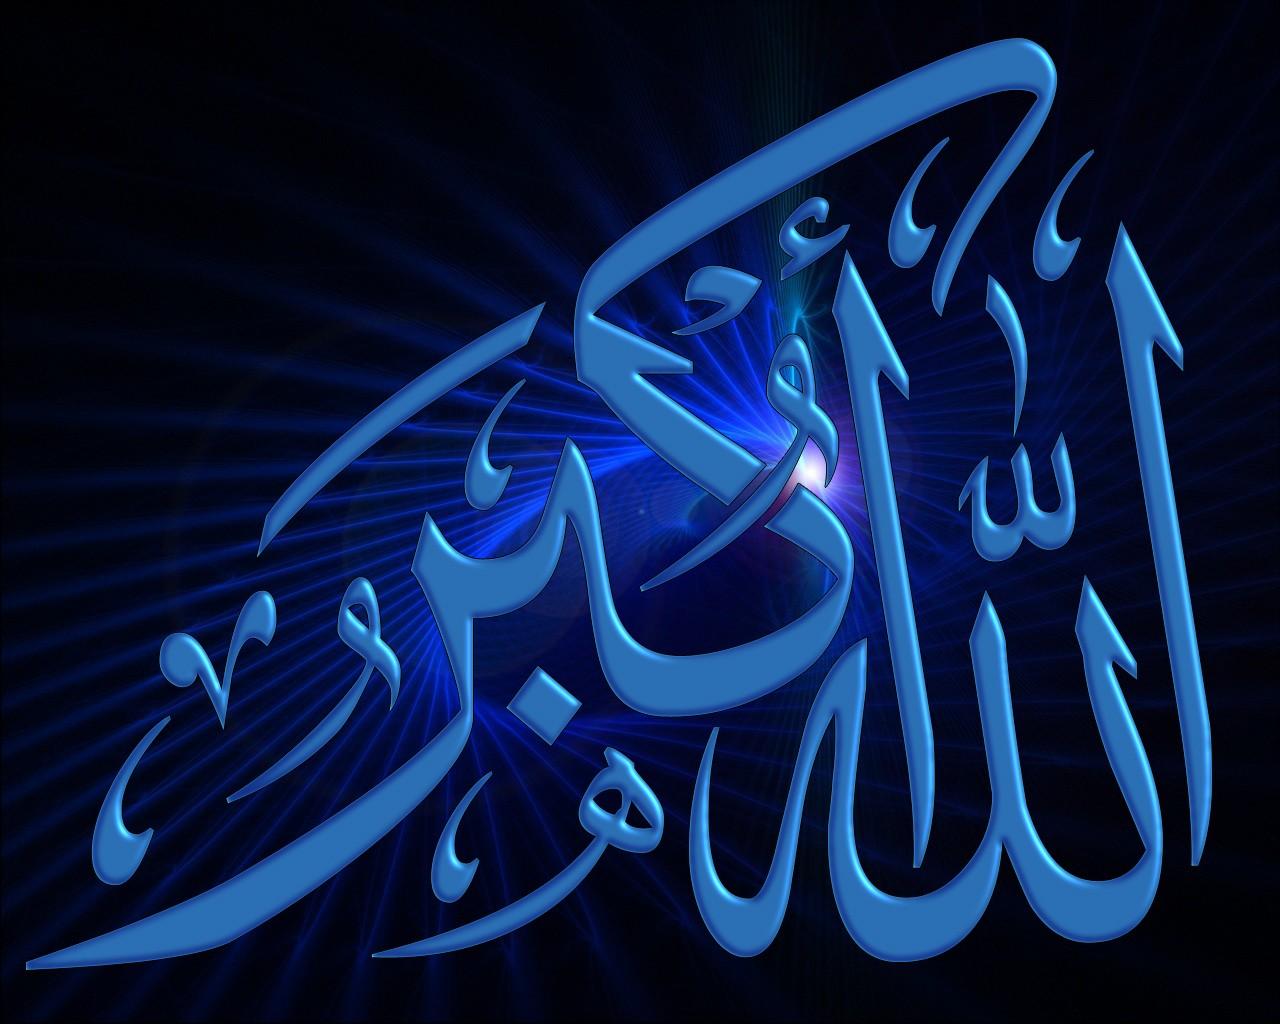 Allah o akbar 2 yasir imran mirza Allah calligraphy wallpaper